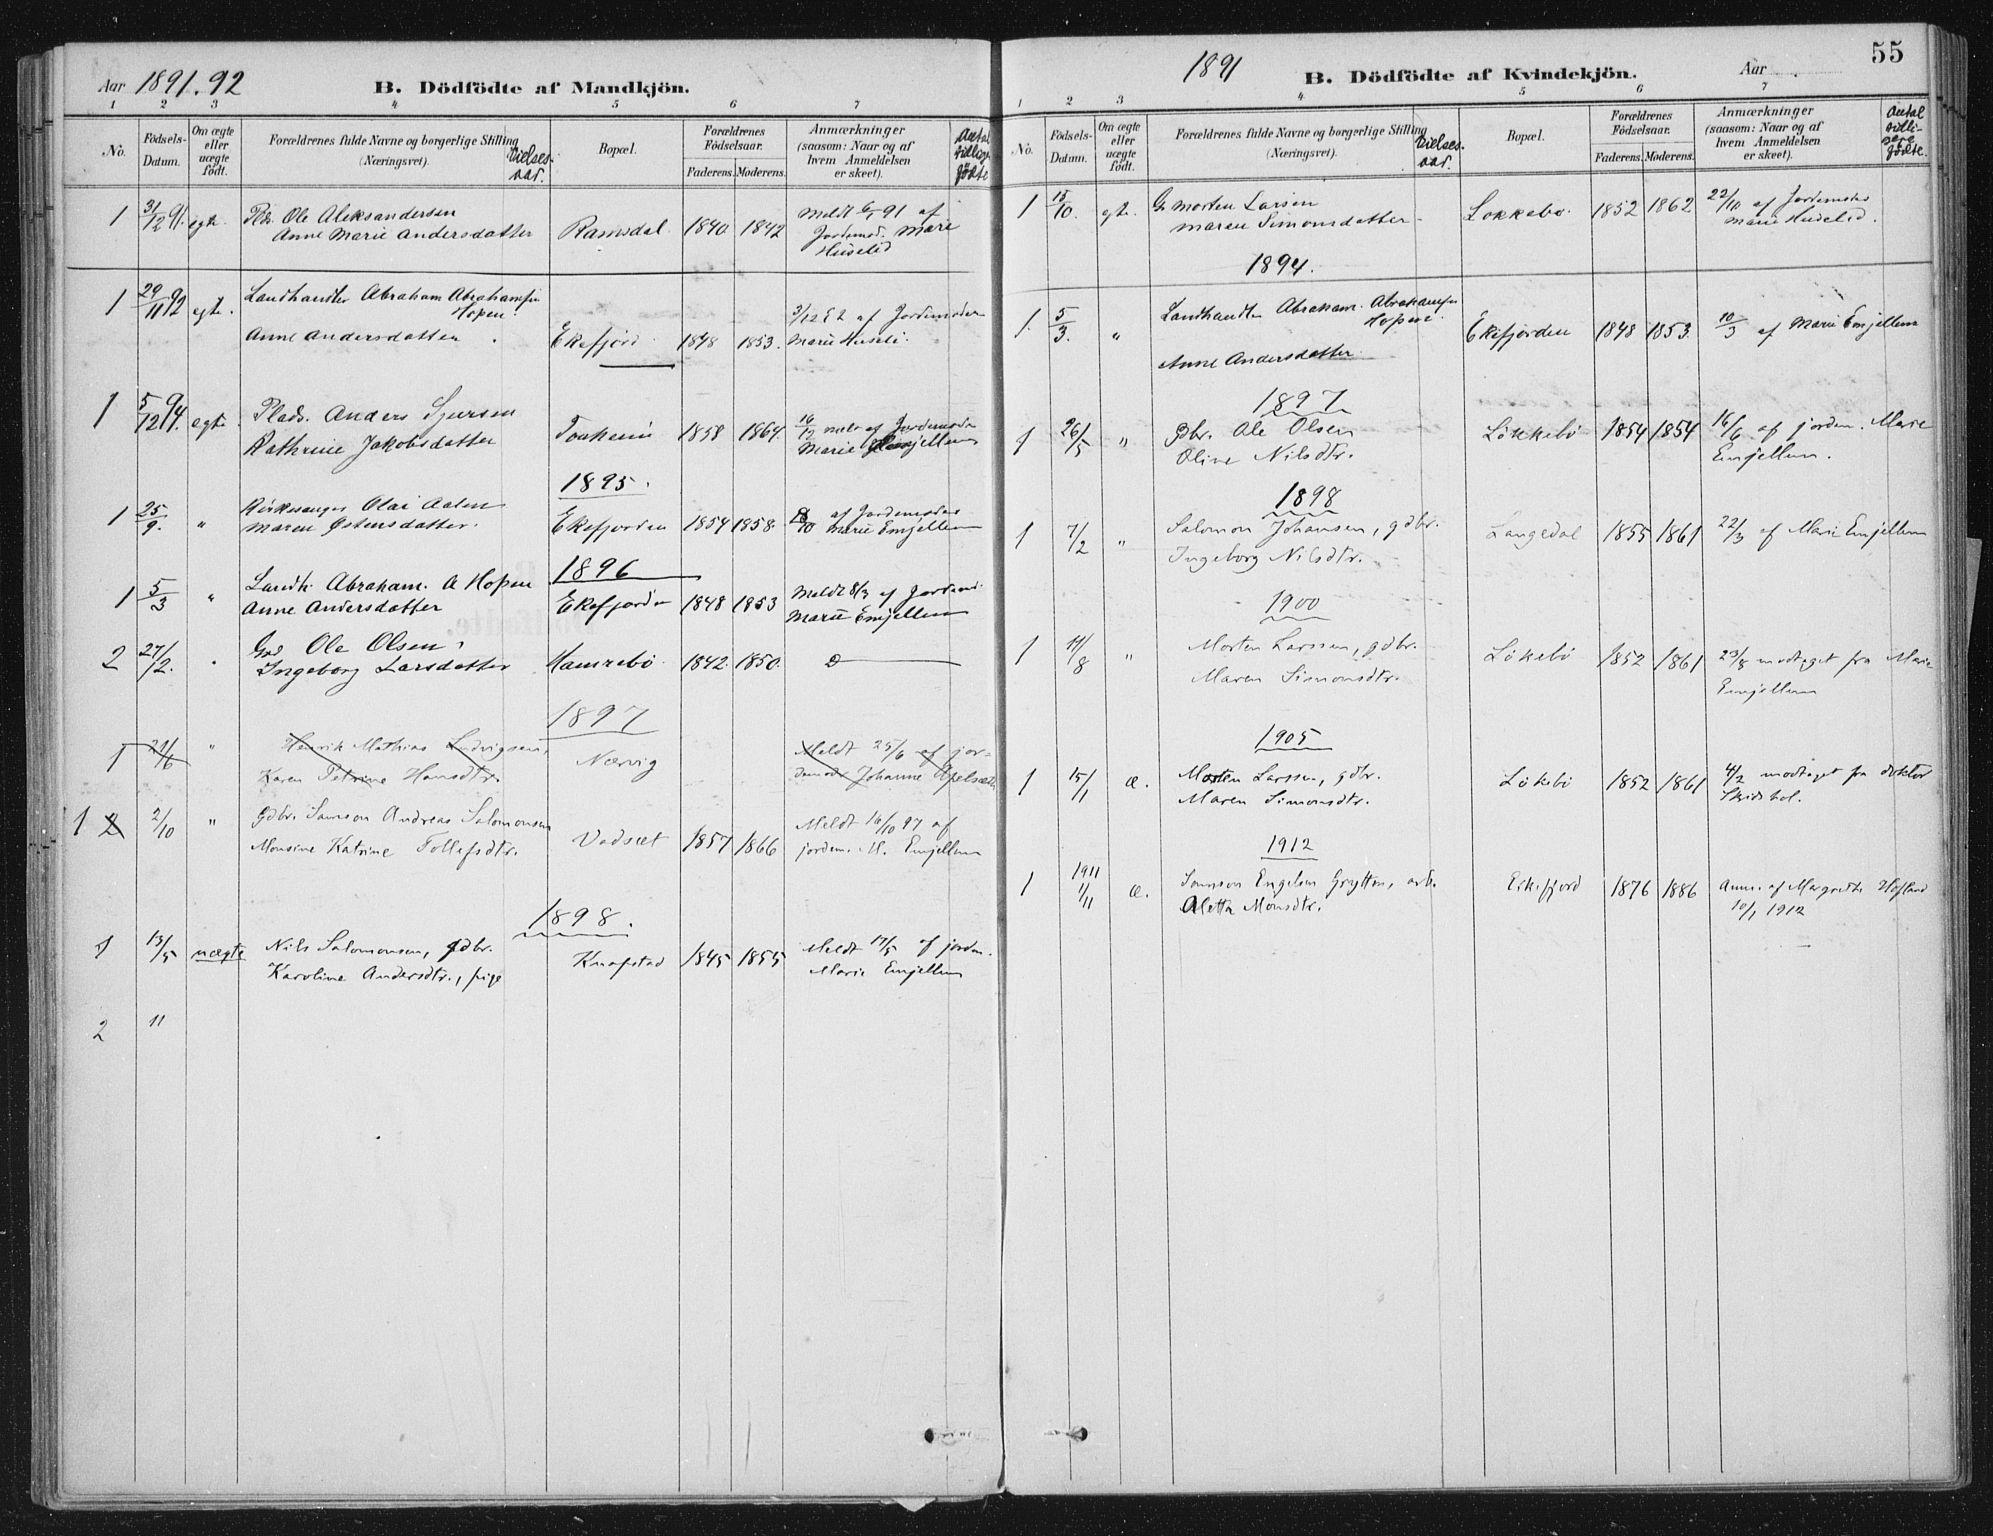 SAB, Kinn sokneprestembete, H/Haa/Haae/L0001: Ministerialbok nr. E 1, 1890-1916, s. 55